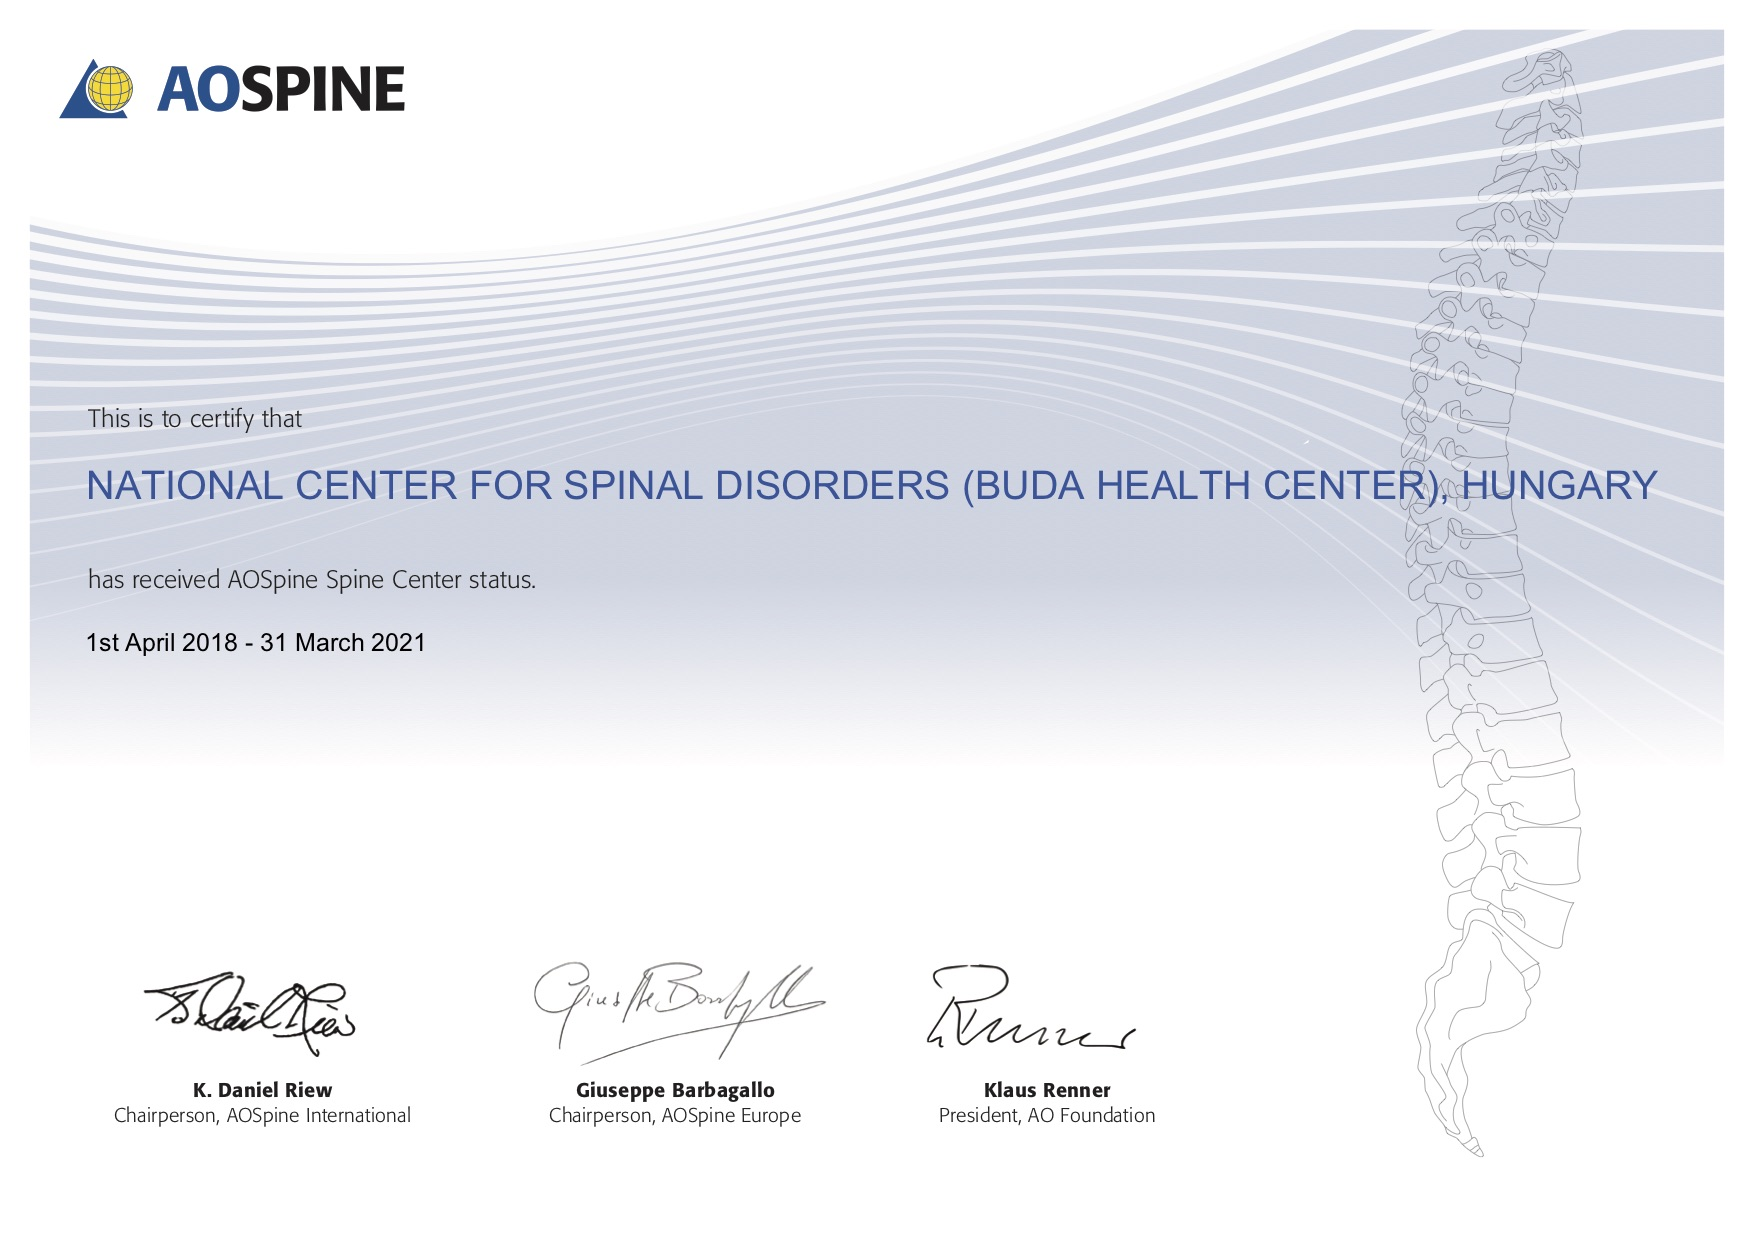 aospine-spine-center-status